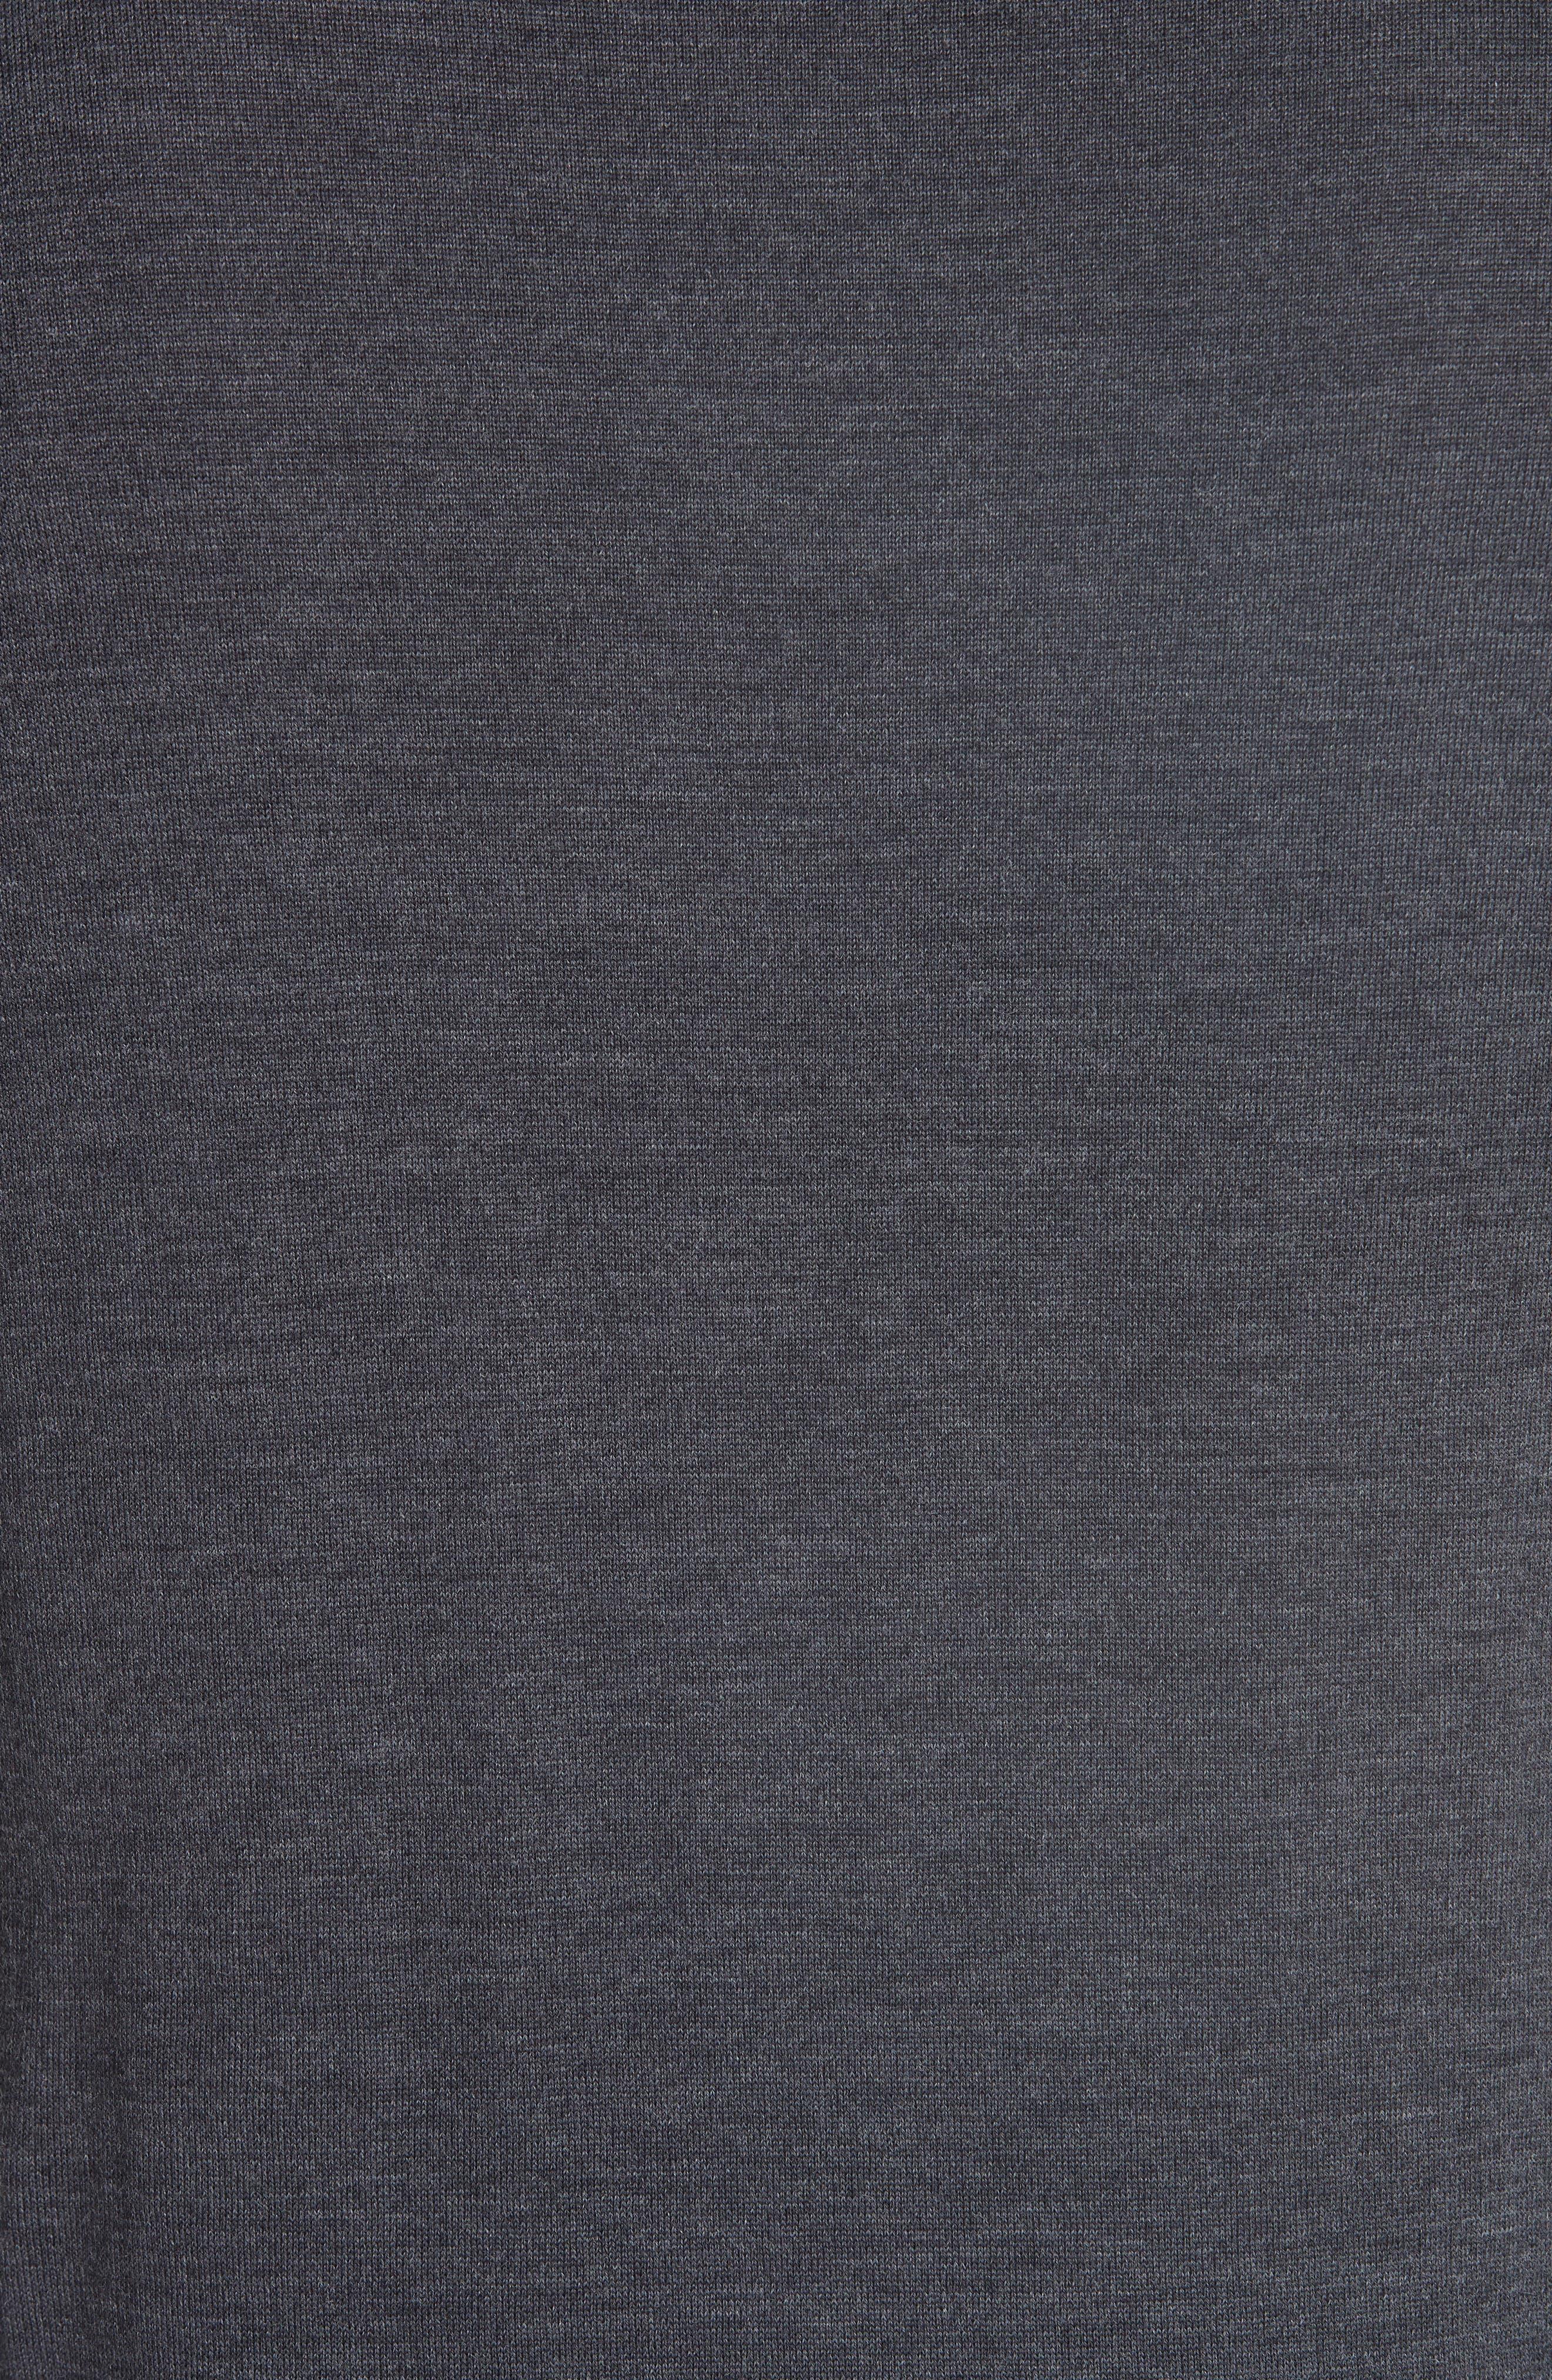 V-Neck Wool Sweater,                             Alternate thumbnail 5, color,                             GREY